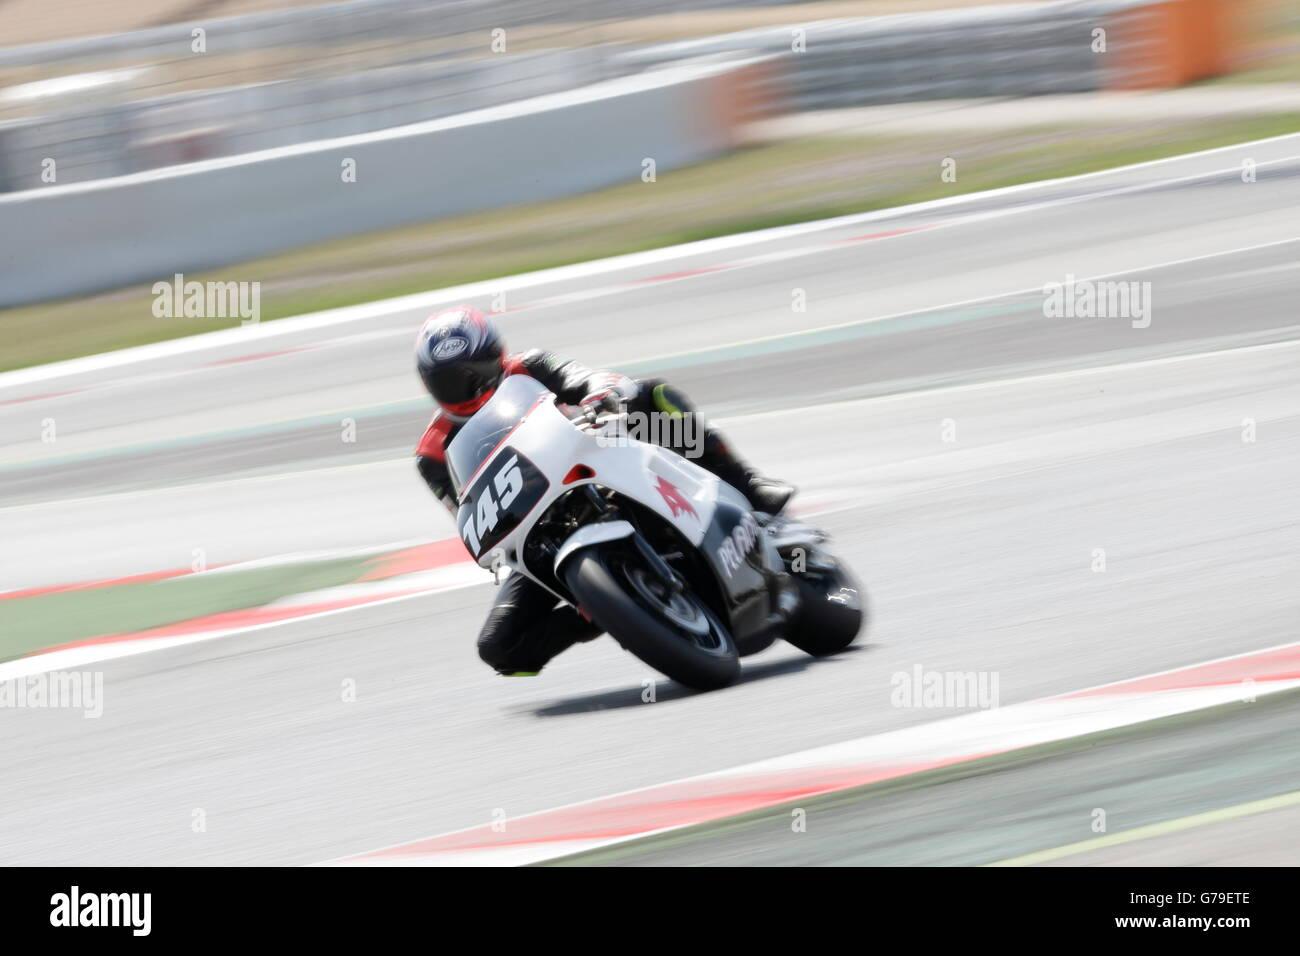 Barcelona, Spain. 26th June, 2016. ESTEVE MOLINA, LLIBERT member of the Moto Club Gavà team, in action during - Stock Image